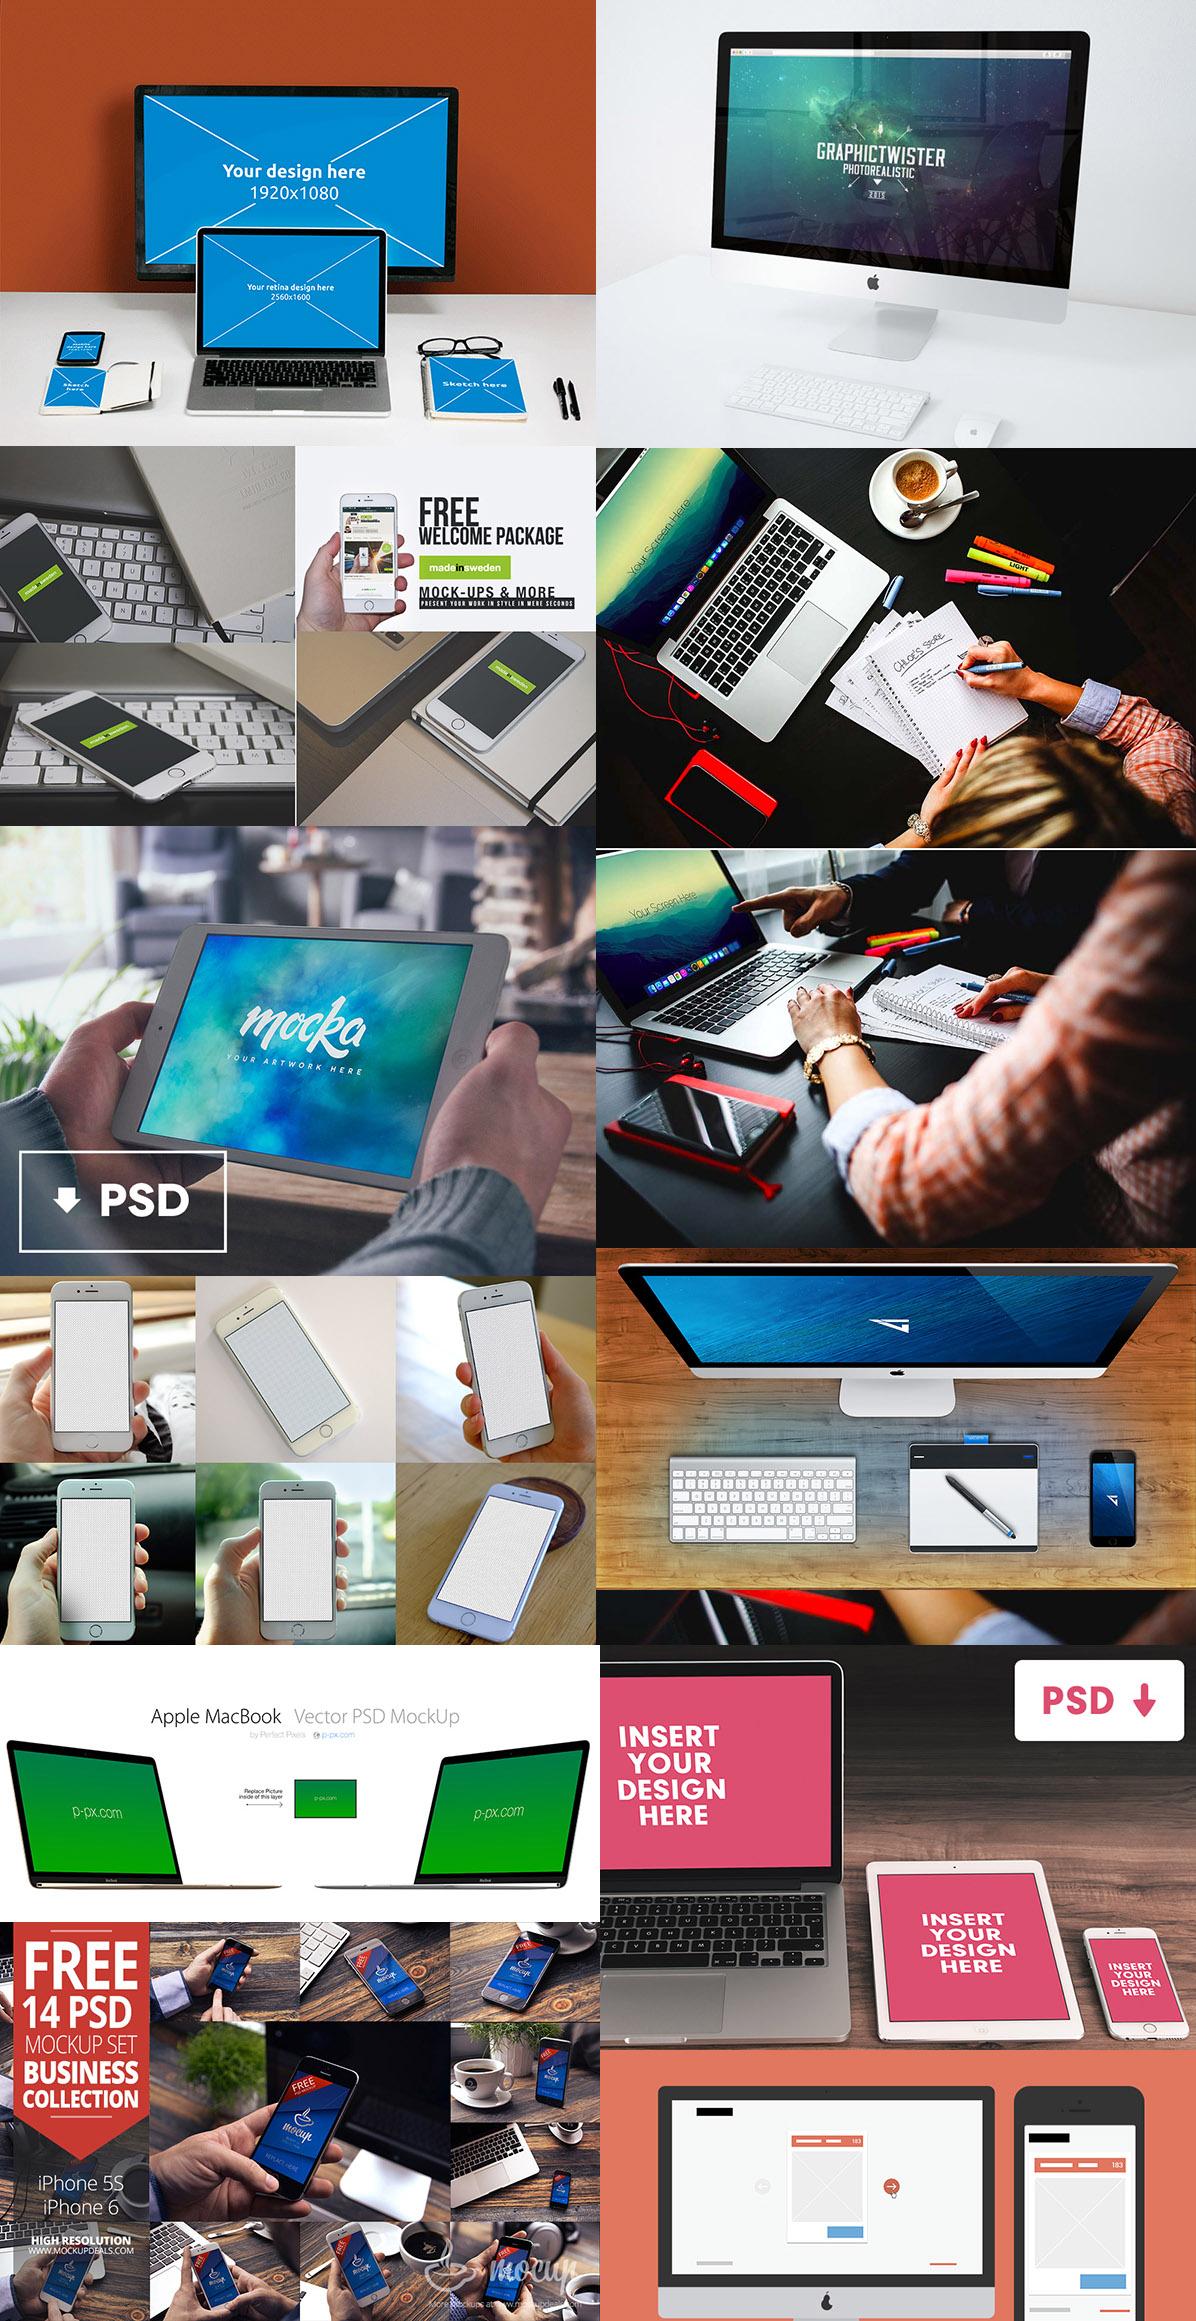 22 Free Apple Device PSD Mock-up Templates